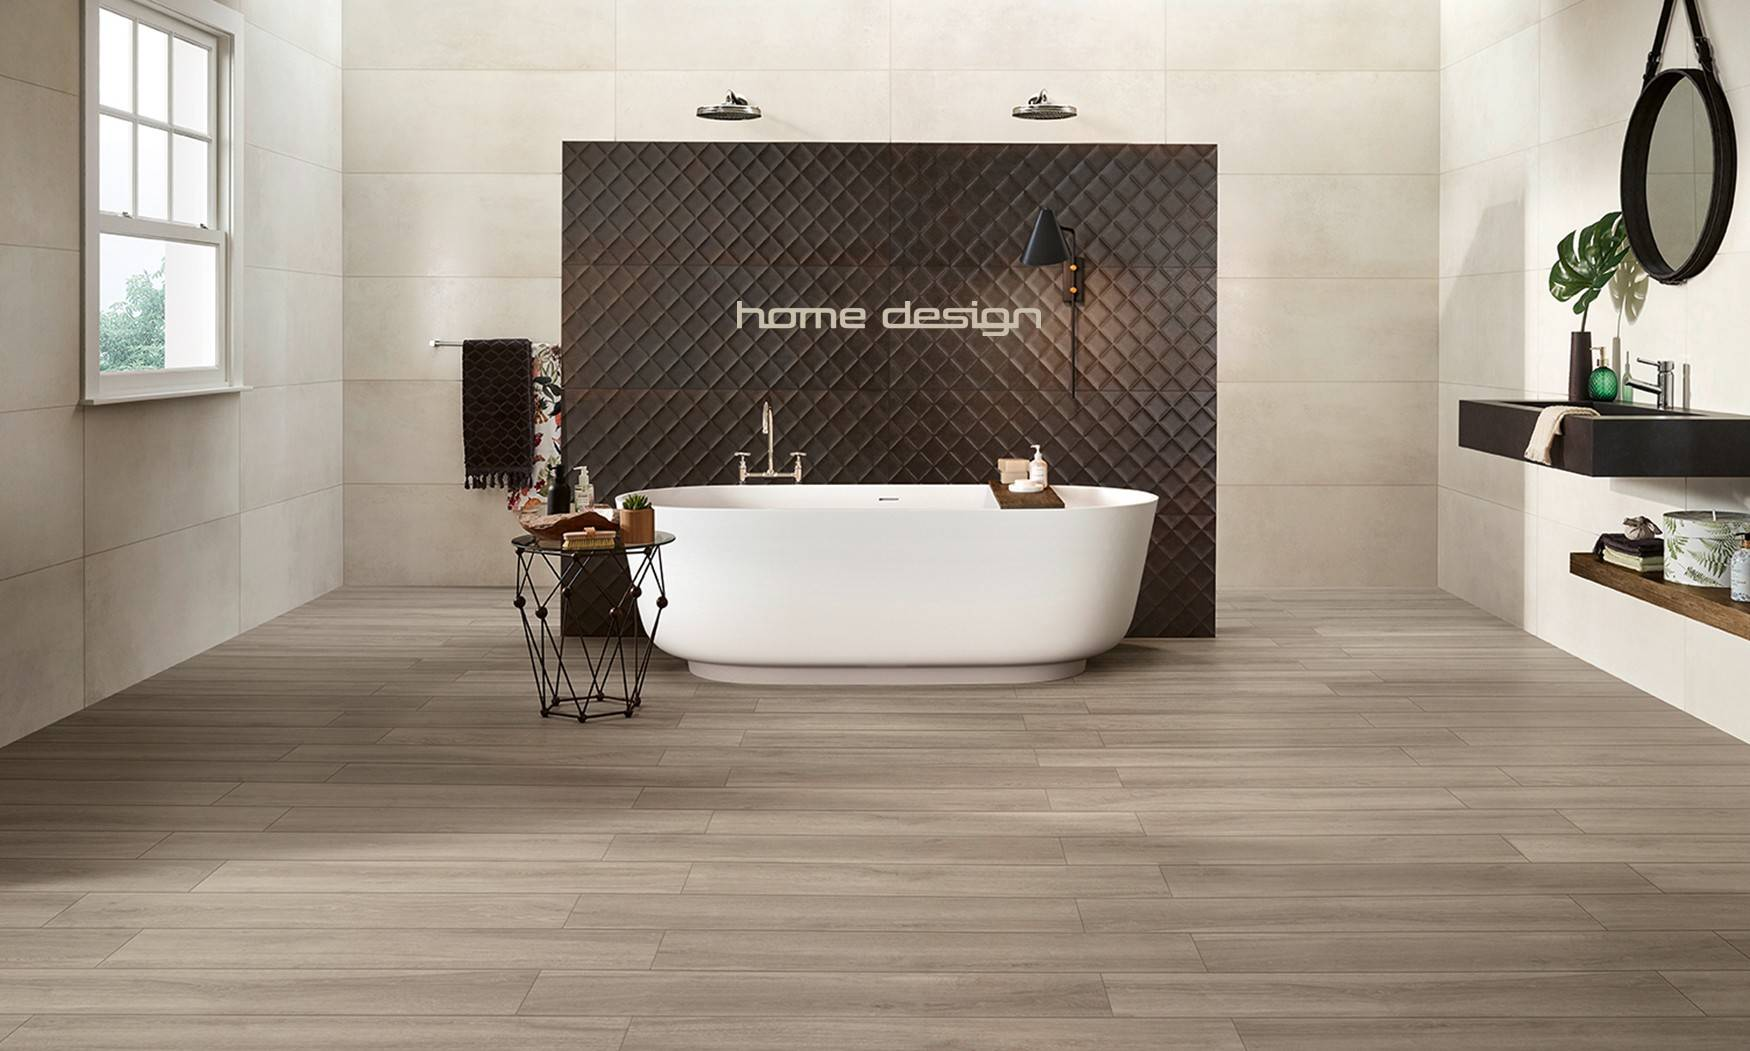 Carrelage Du Grand Sud home design - votre spécialiste carrelage à estrablin (38)